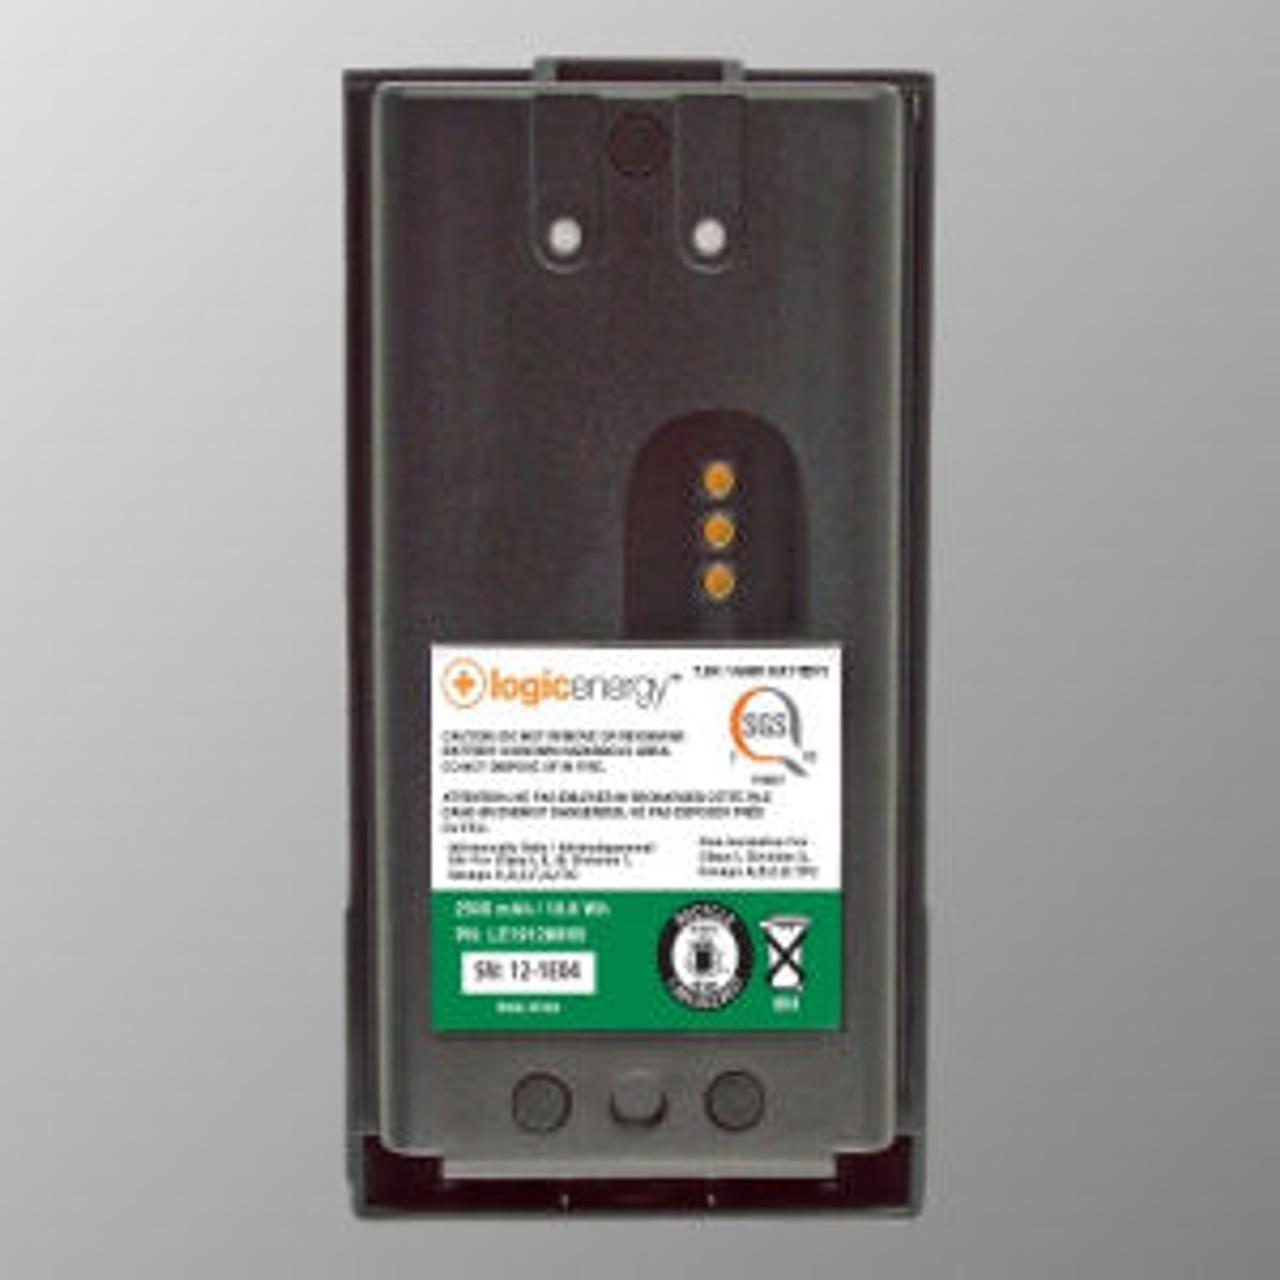 M/A-Com 700P Intrinsically Safe Battery - 2500mAh Ni-MH